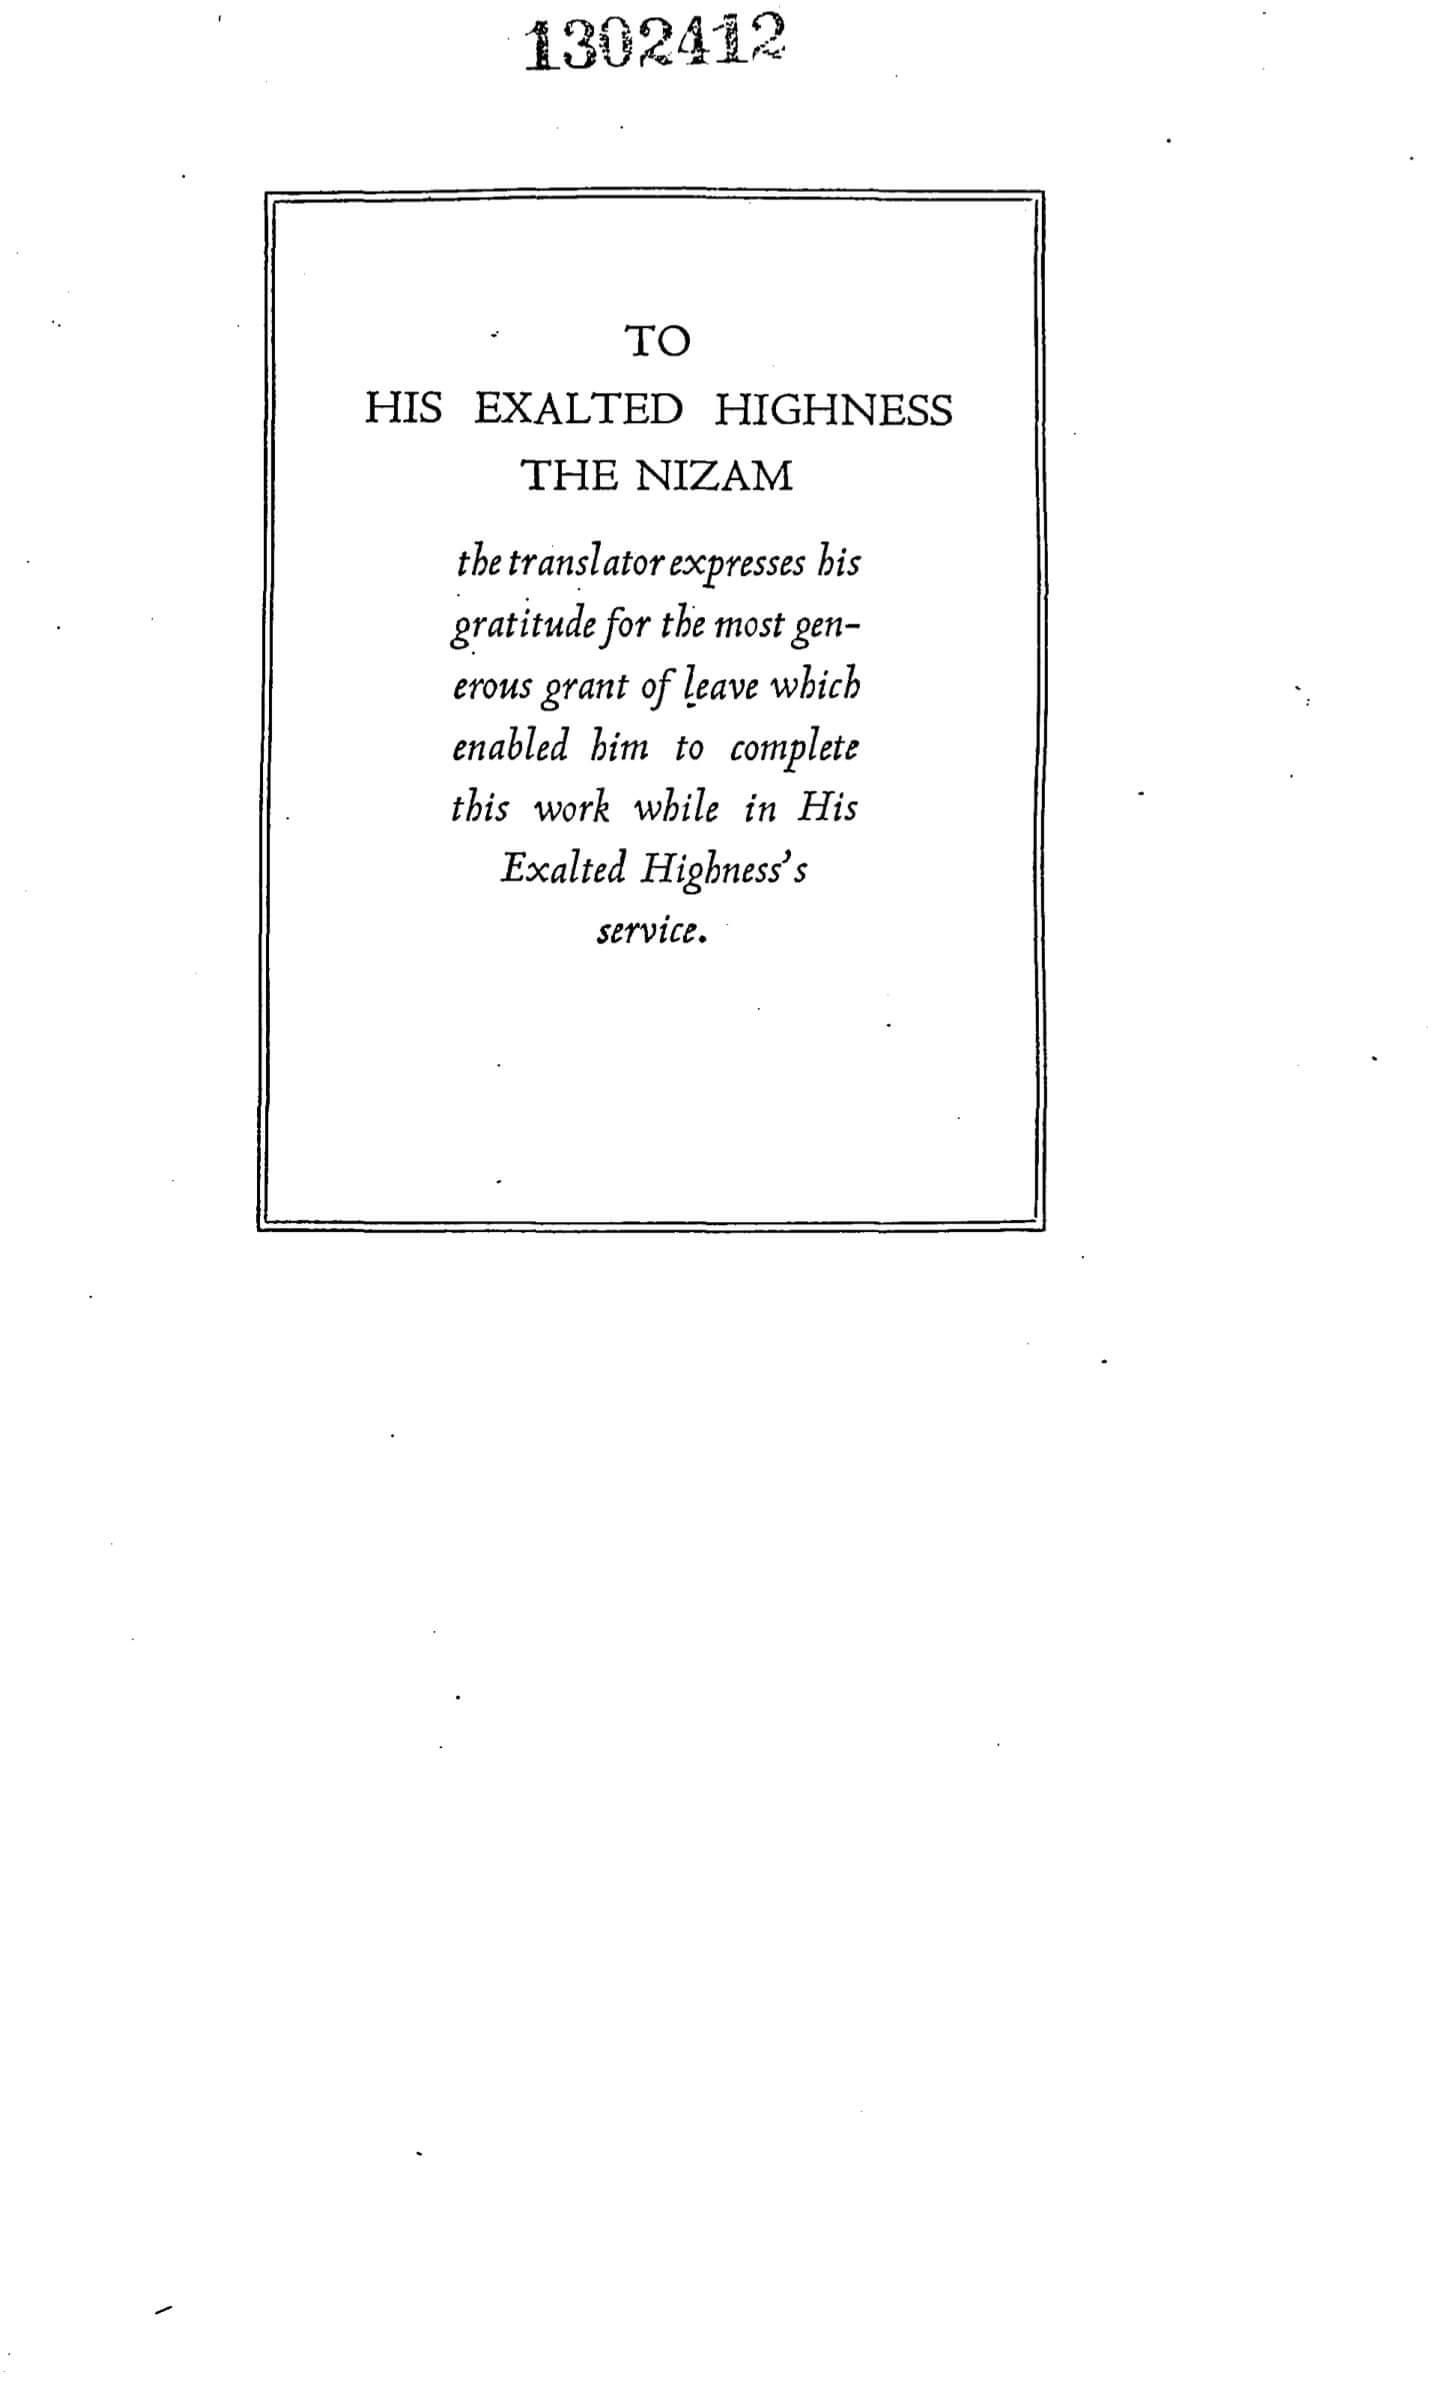 Marmaduke Pickthall 1930 Quran Explorer, Page 3